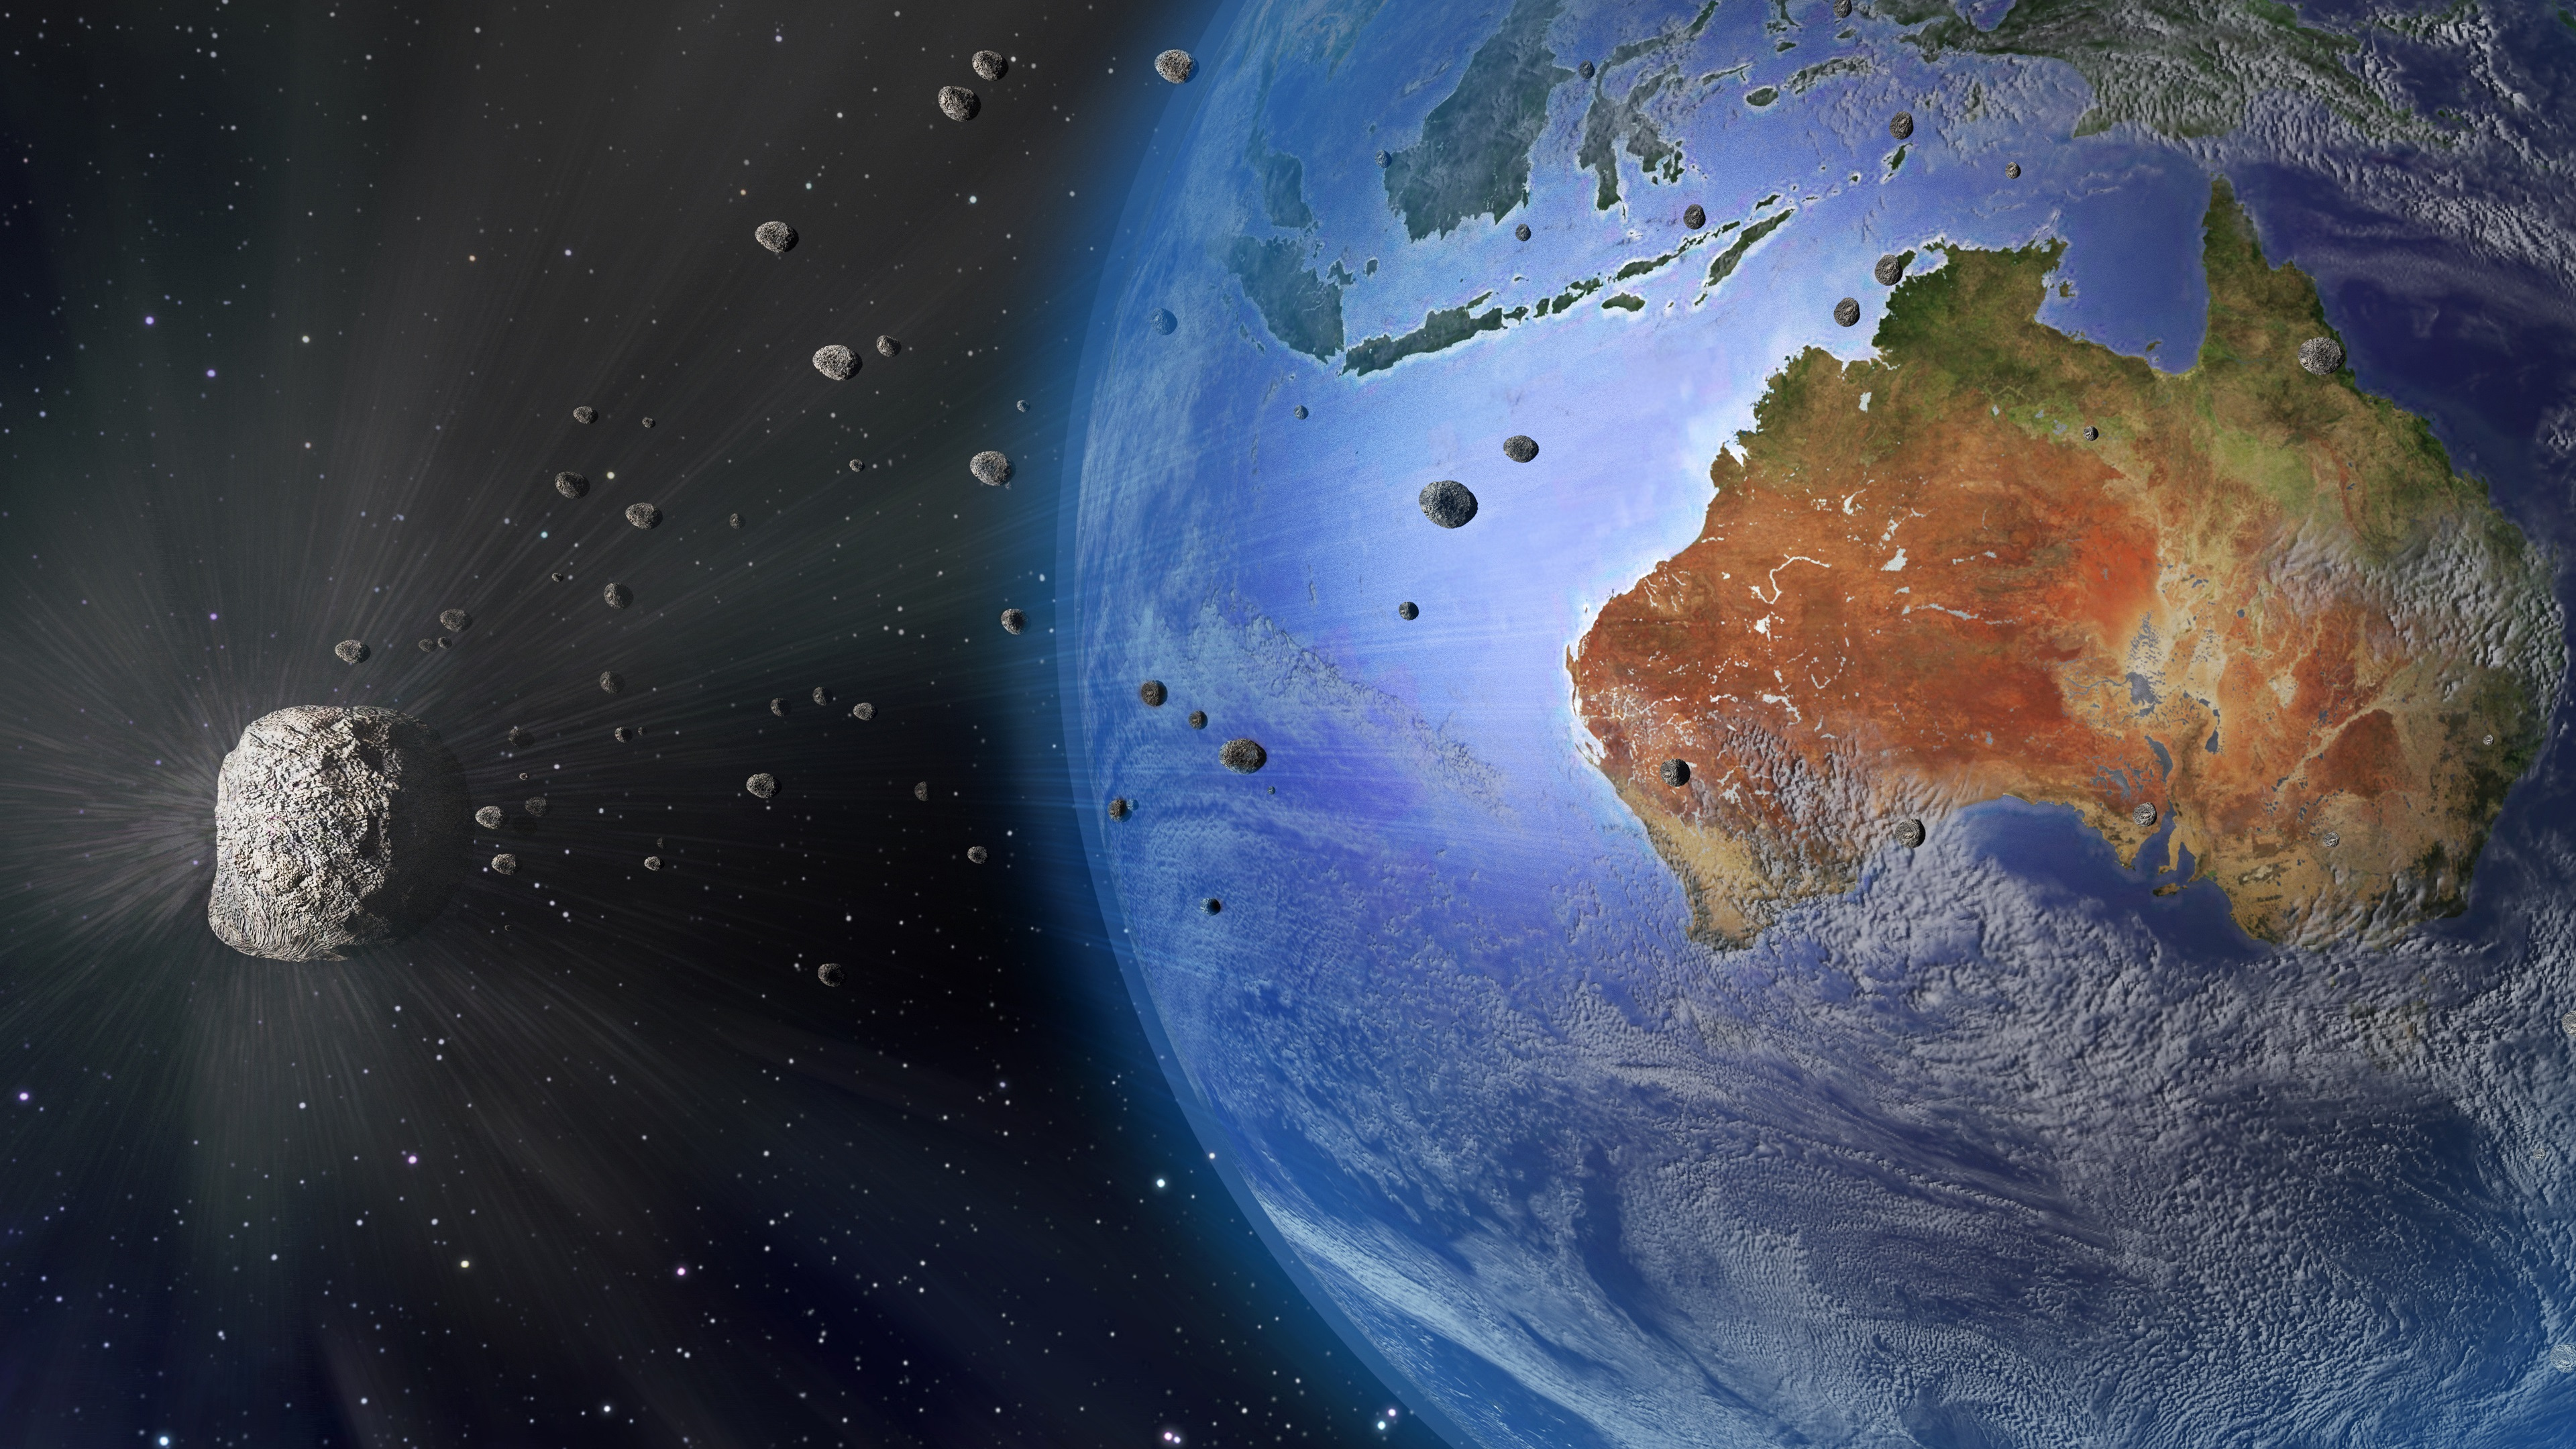 Wallpaper Earth, Australia, meteorite, space 3840x2160 UHD